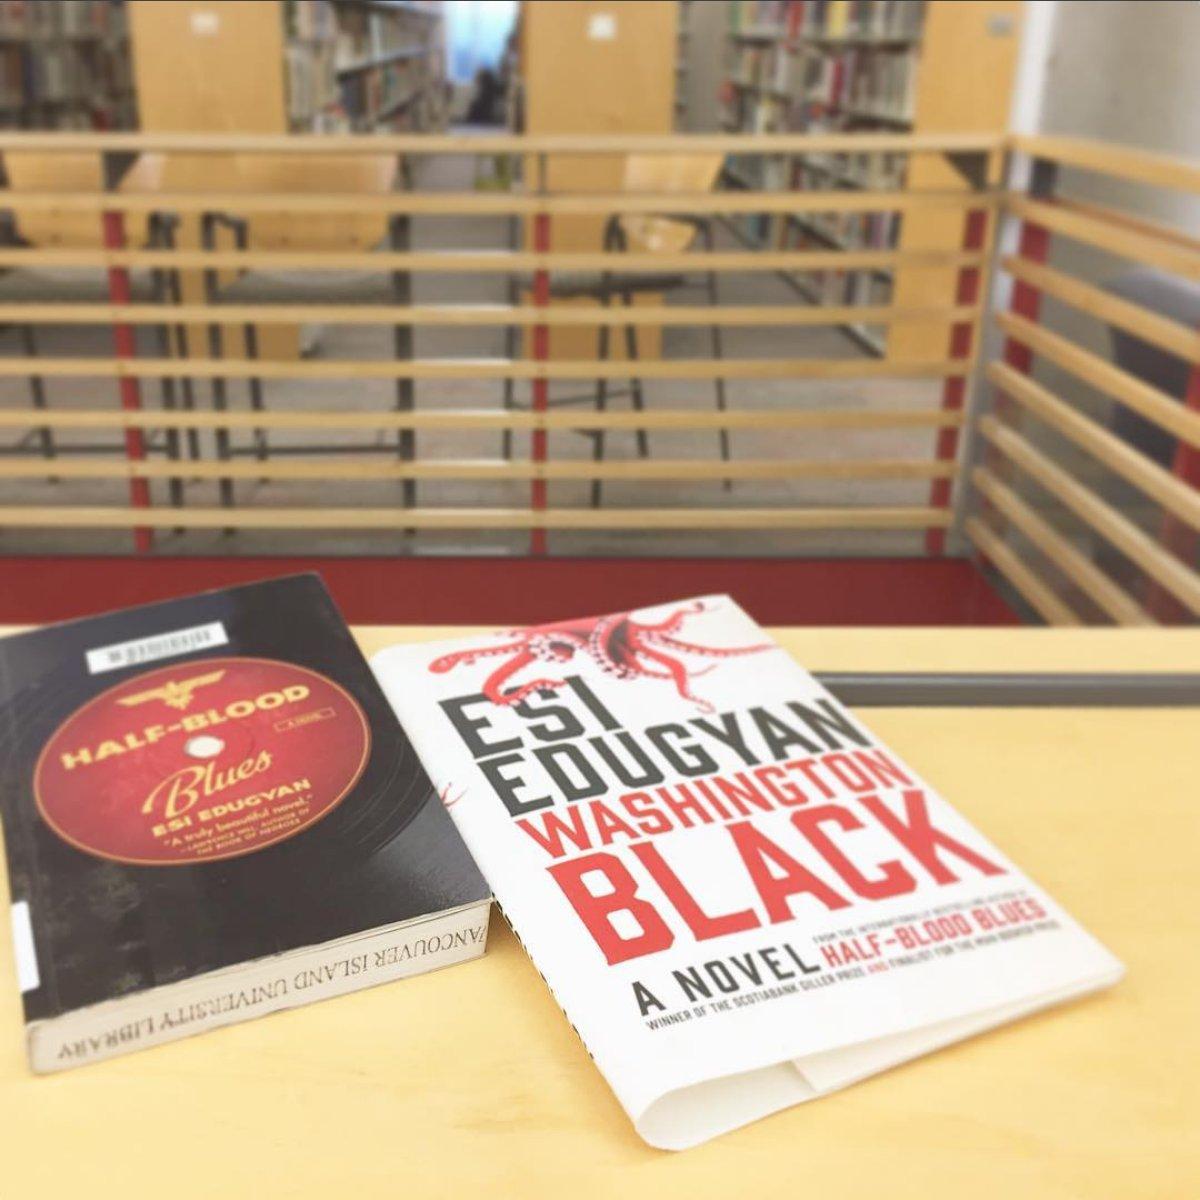 Viu Library On Twitter Congrats To Vanisle Author Esi Edugyan